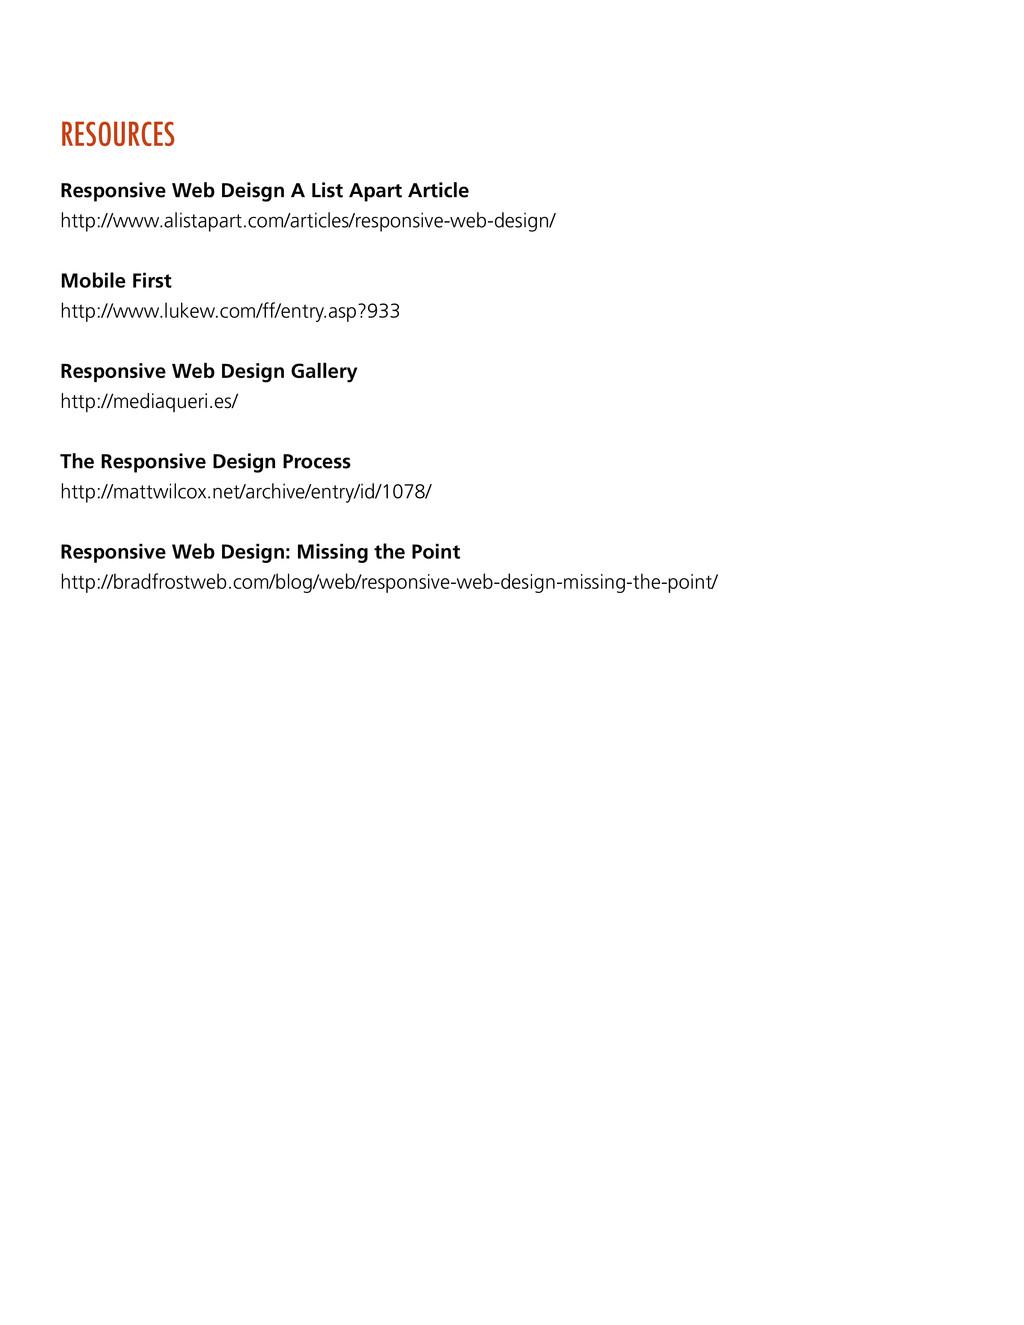 RESOURCES Responsive Web Deisgn A List Apart Ar...